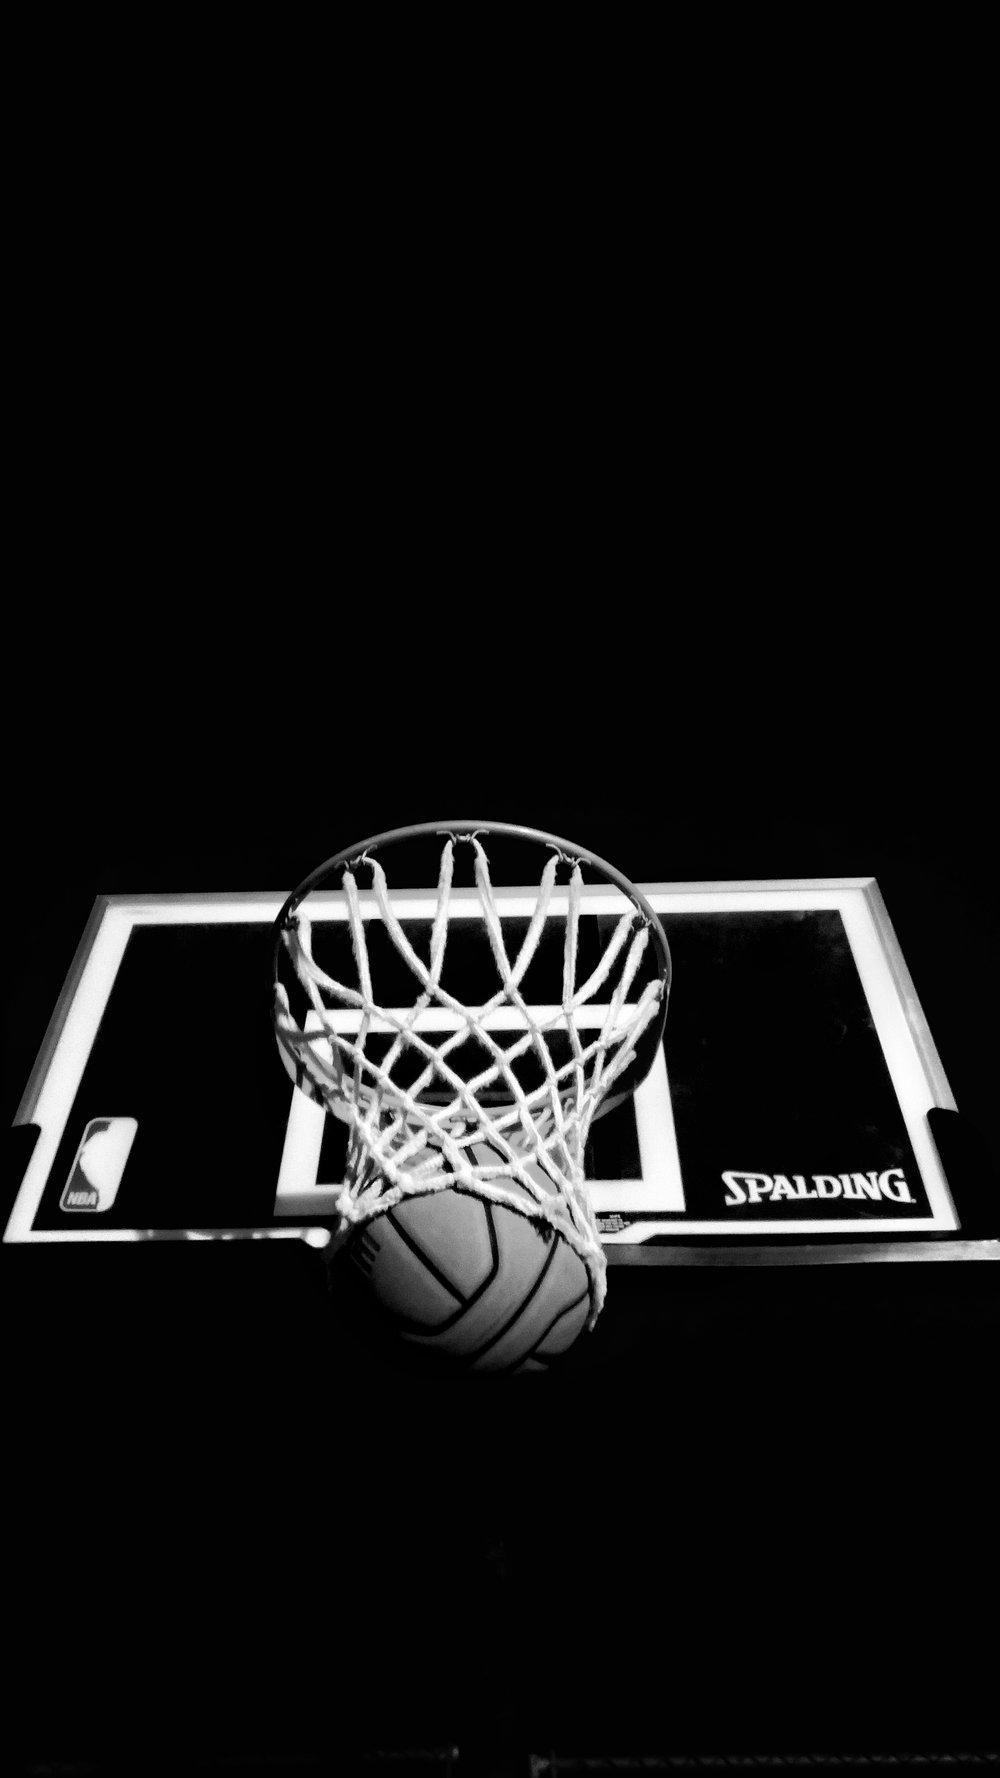 Basketball Going in Basket.jpeg